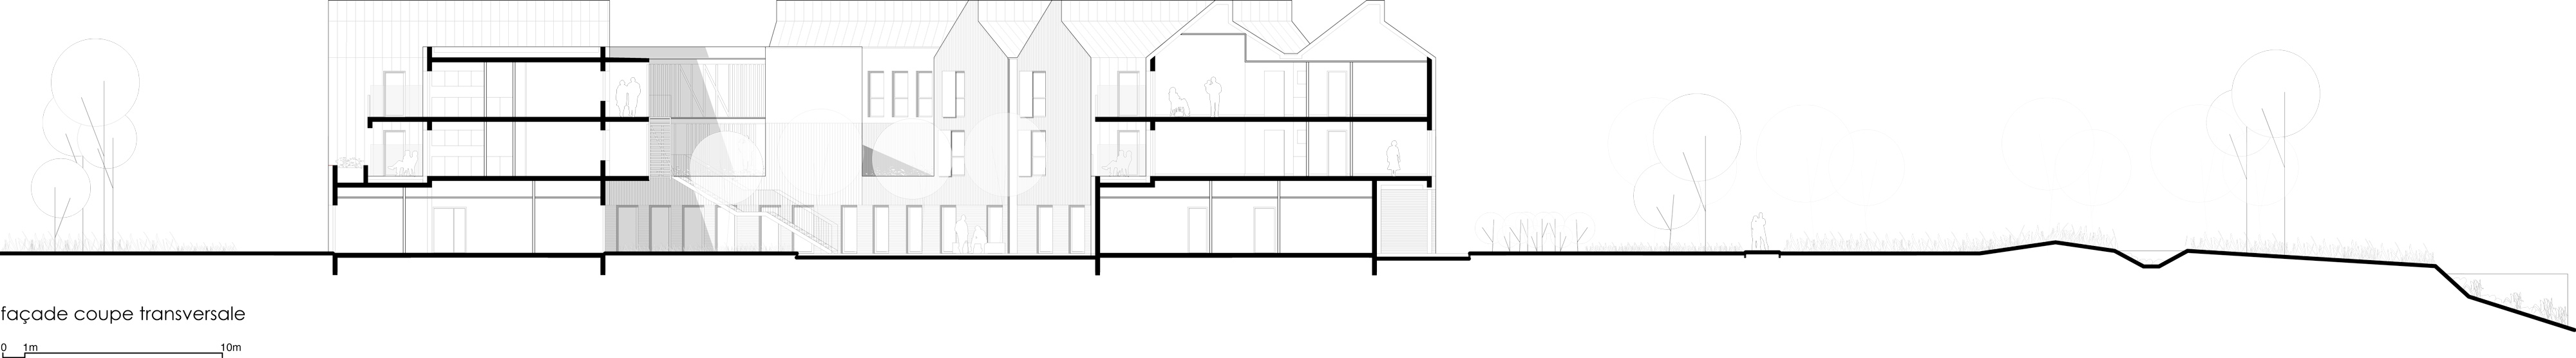 facade-cpe-transversale_auxi